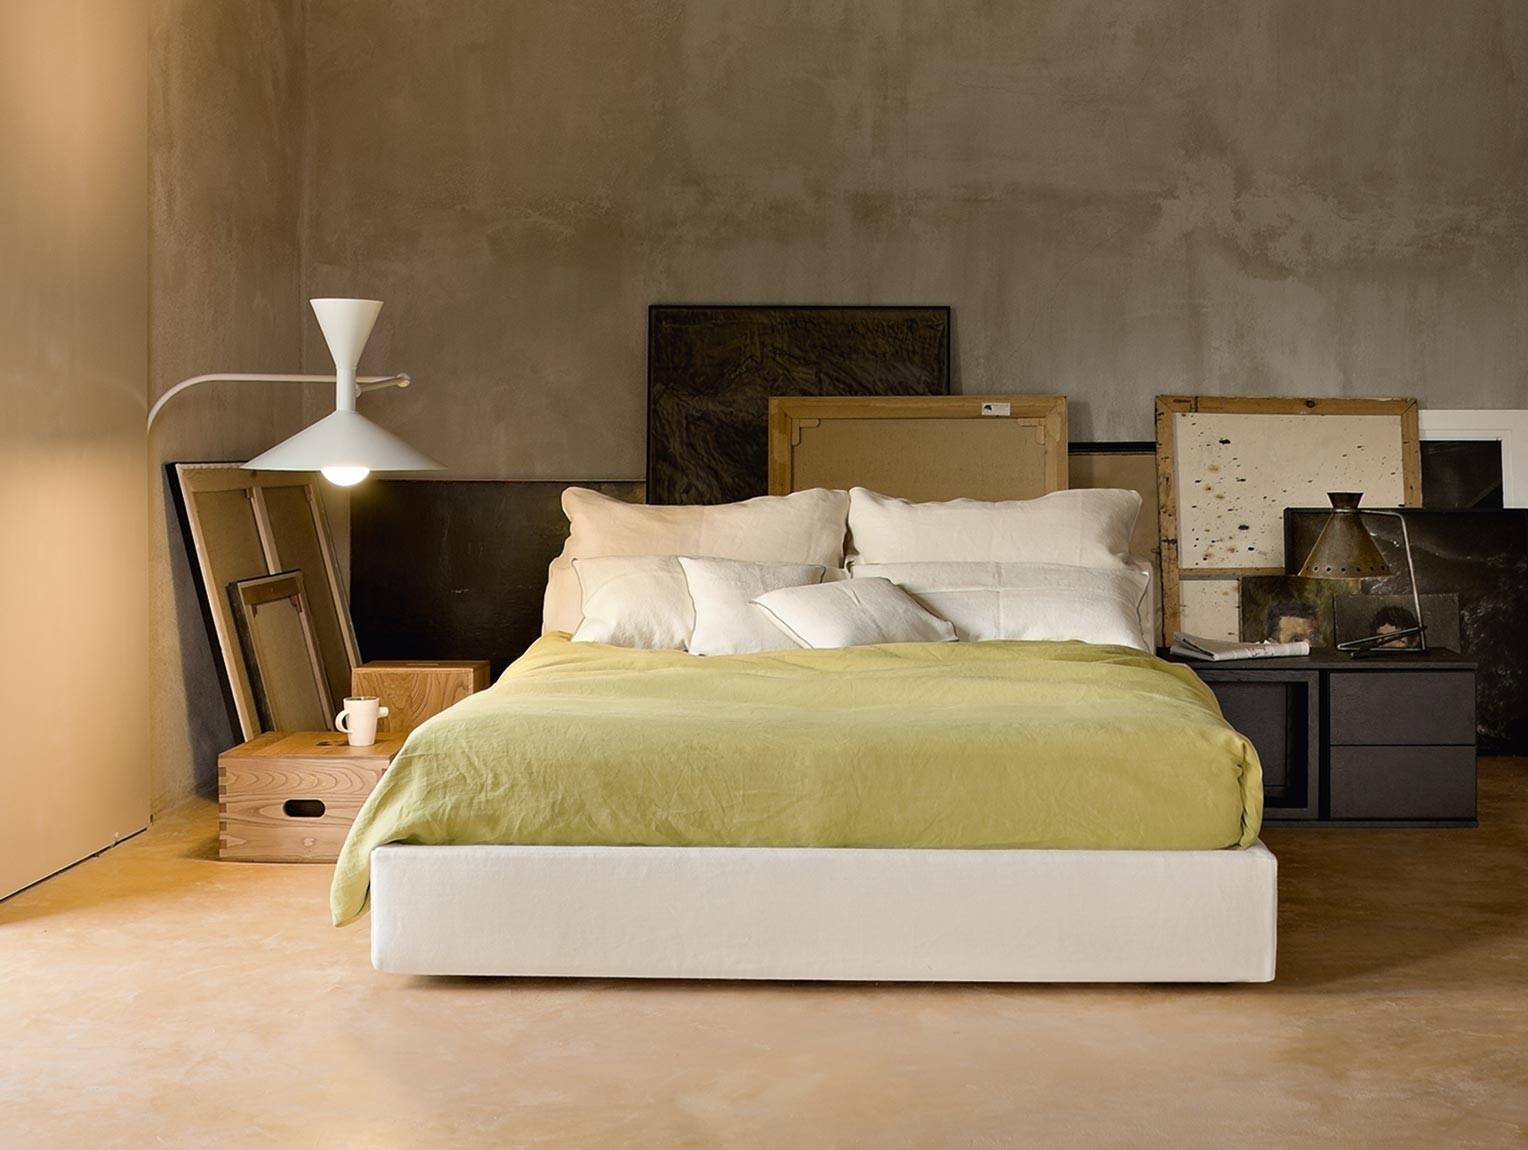 Lampe de marseille lampada a parete nemo acquista online deplai